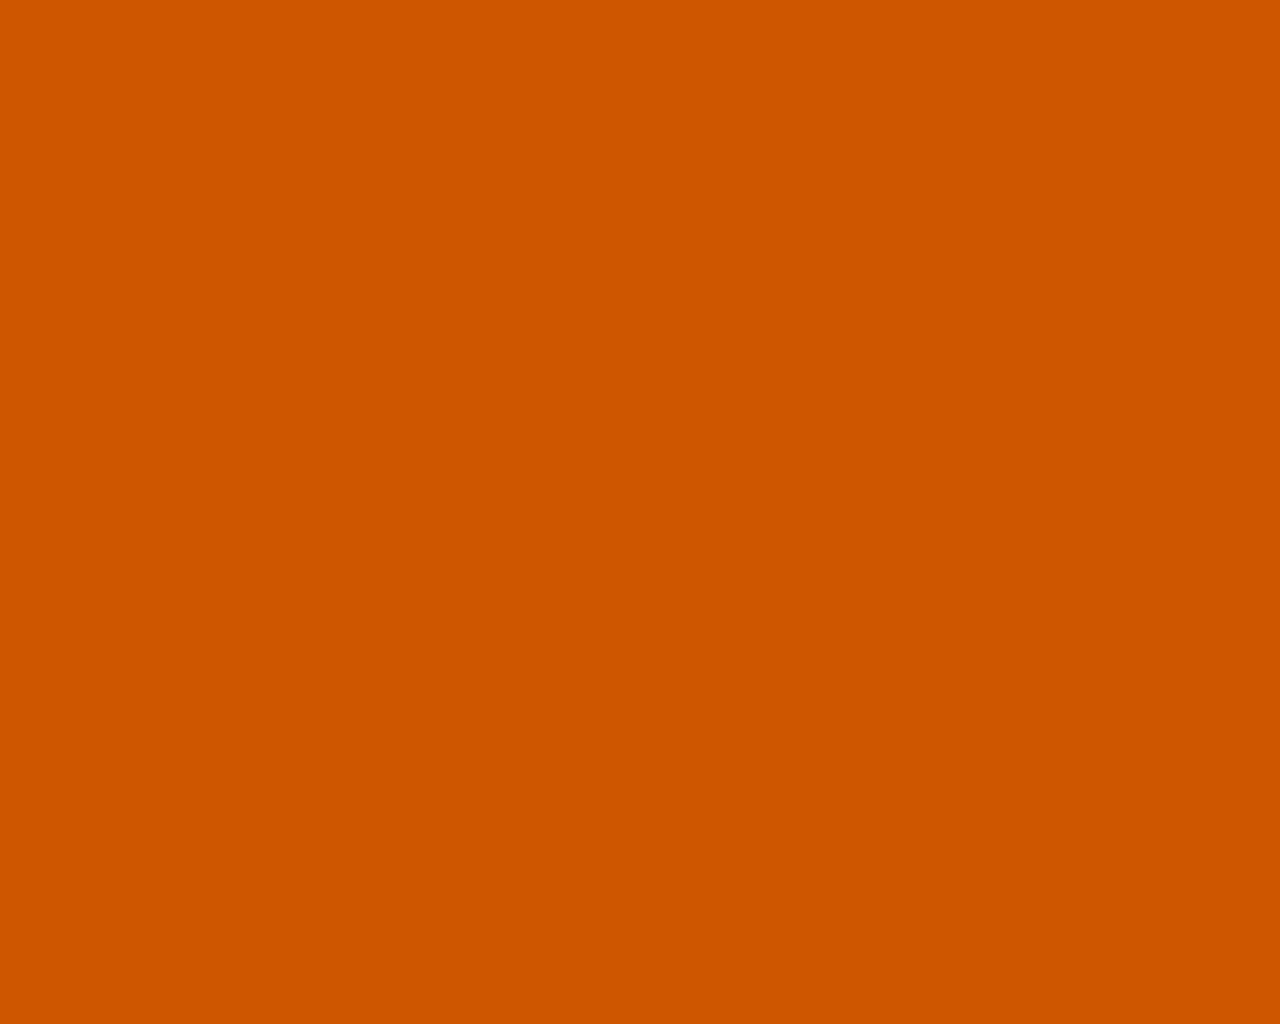 Burnt Orange Wallpaper  Wallpapersafari. Kitchen Cabinets Wholesale Miami. Contemporary Kitchens With White Cabinets. Standard Height Kitchen Cabinets. B And Q Kitchen Cabinets